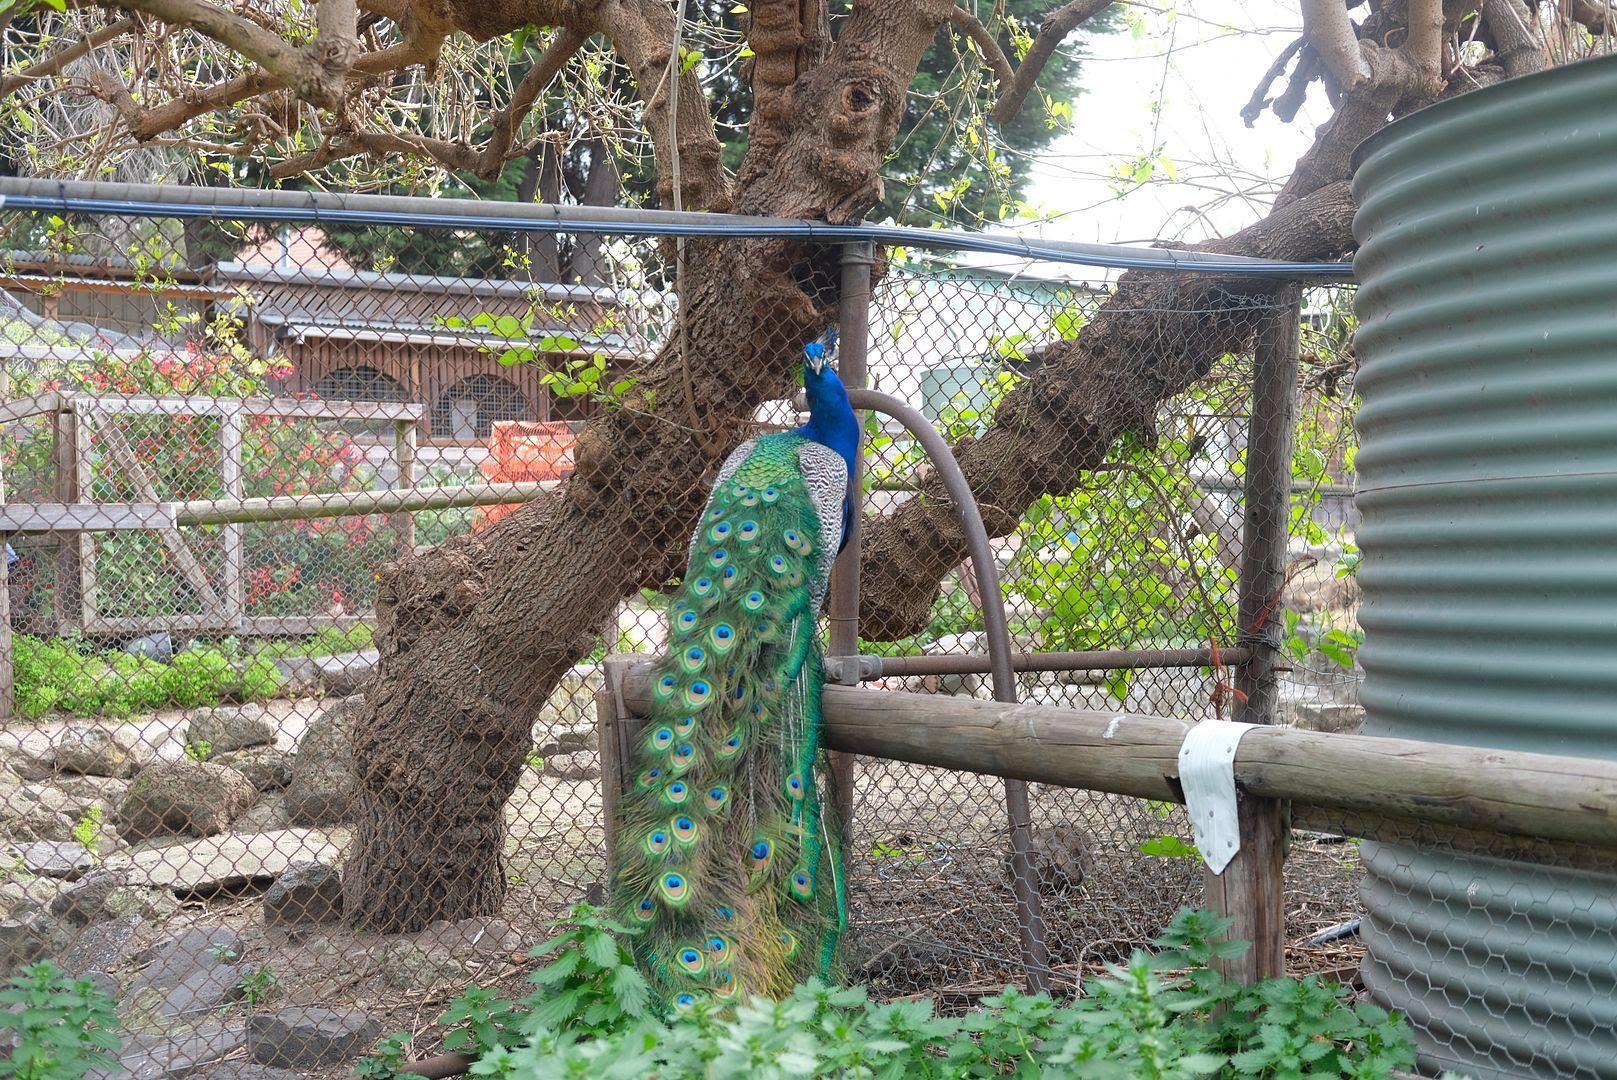 photo Collingwood Childrens Farm 2.jpg